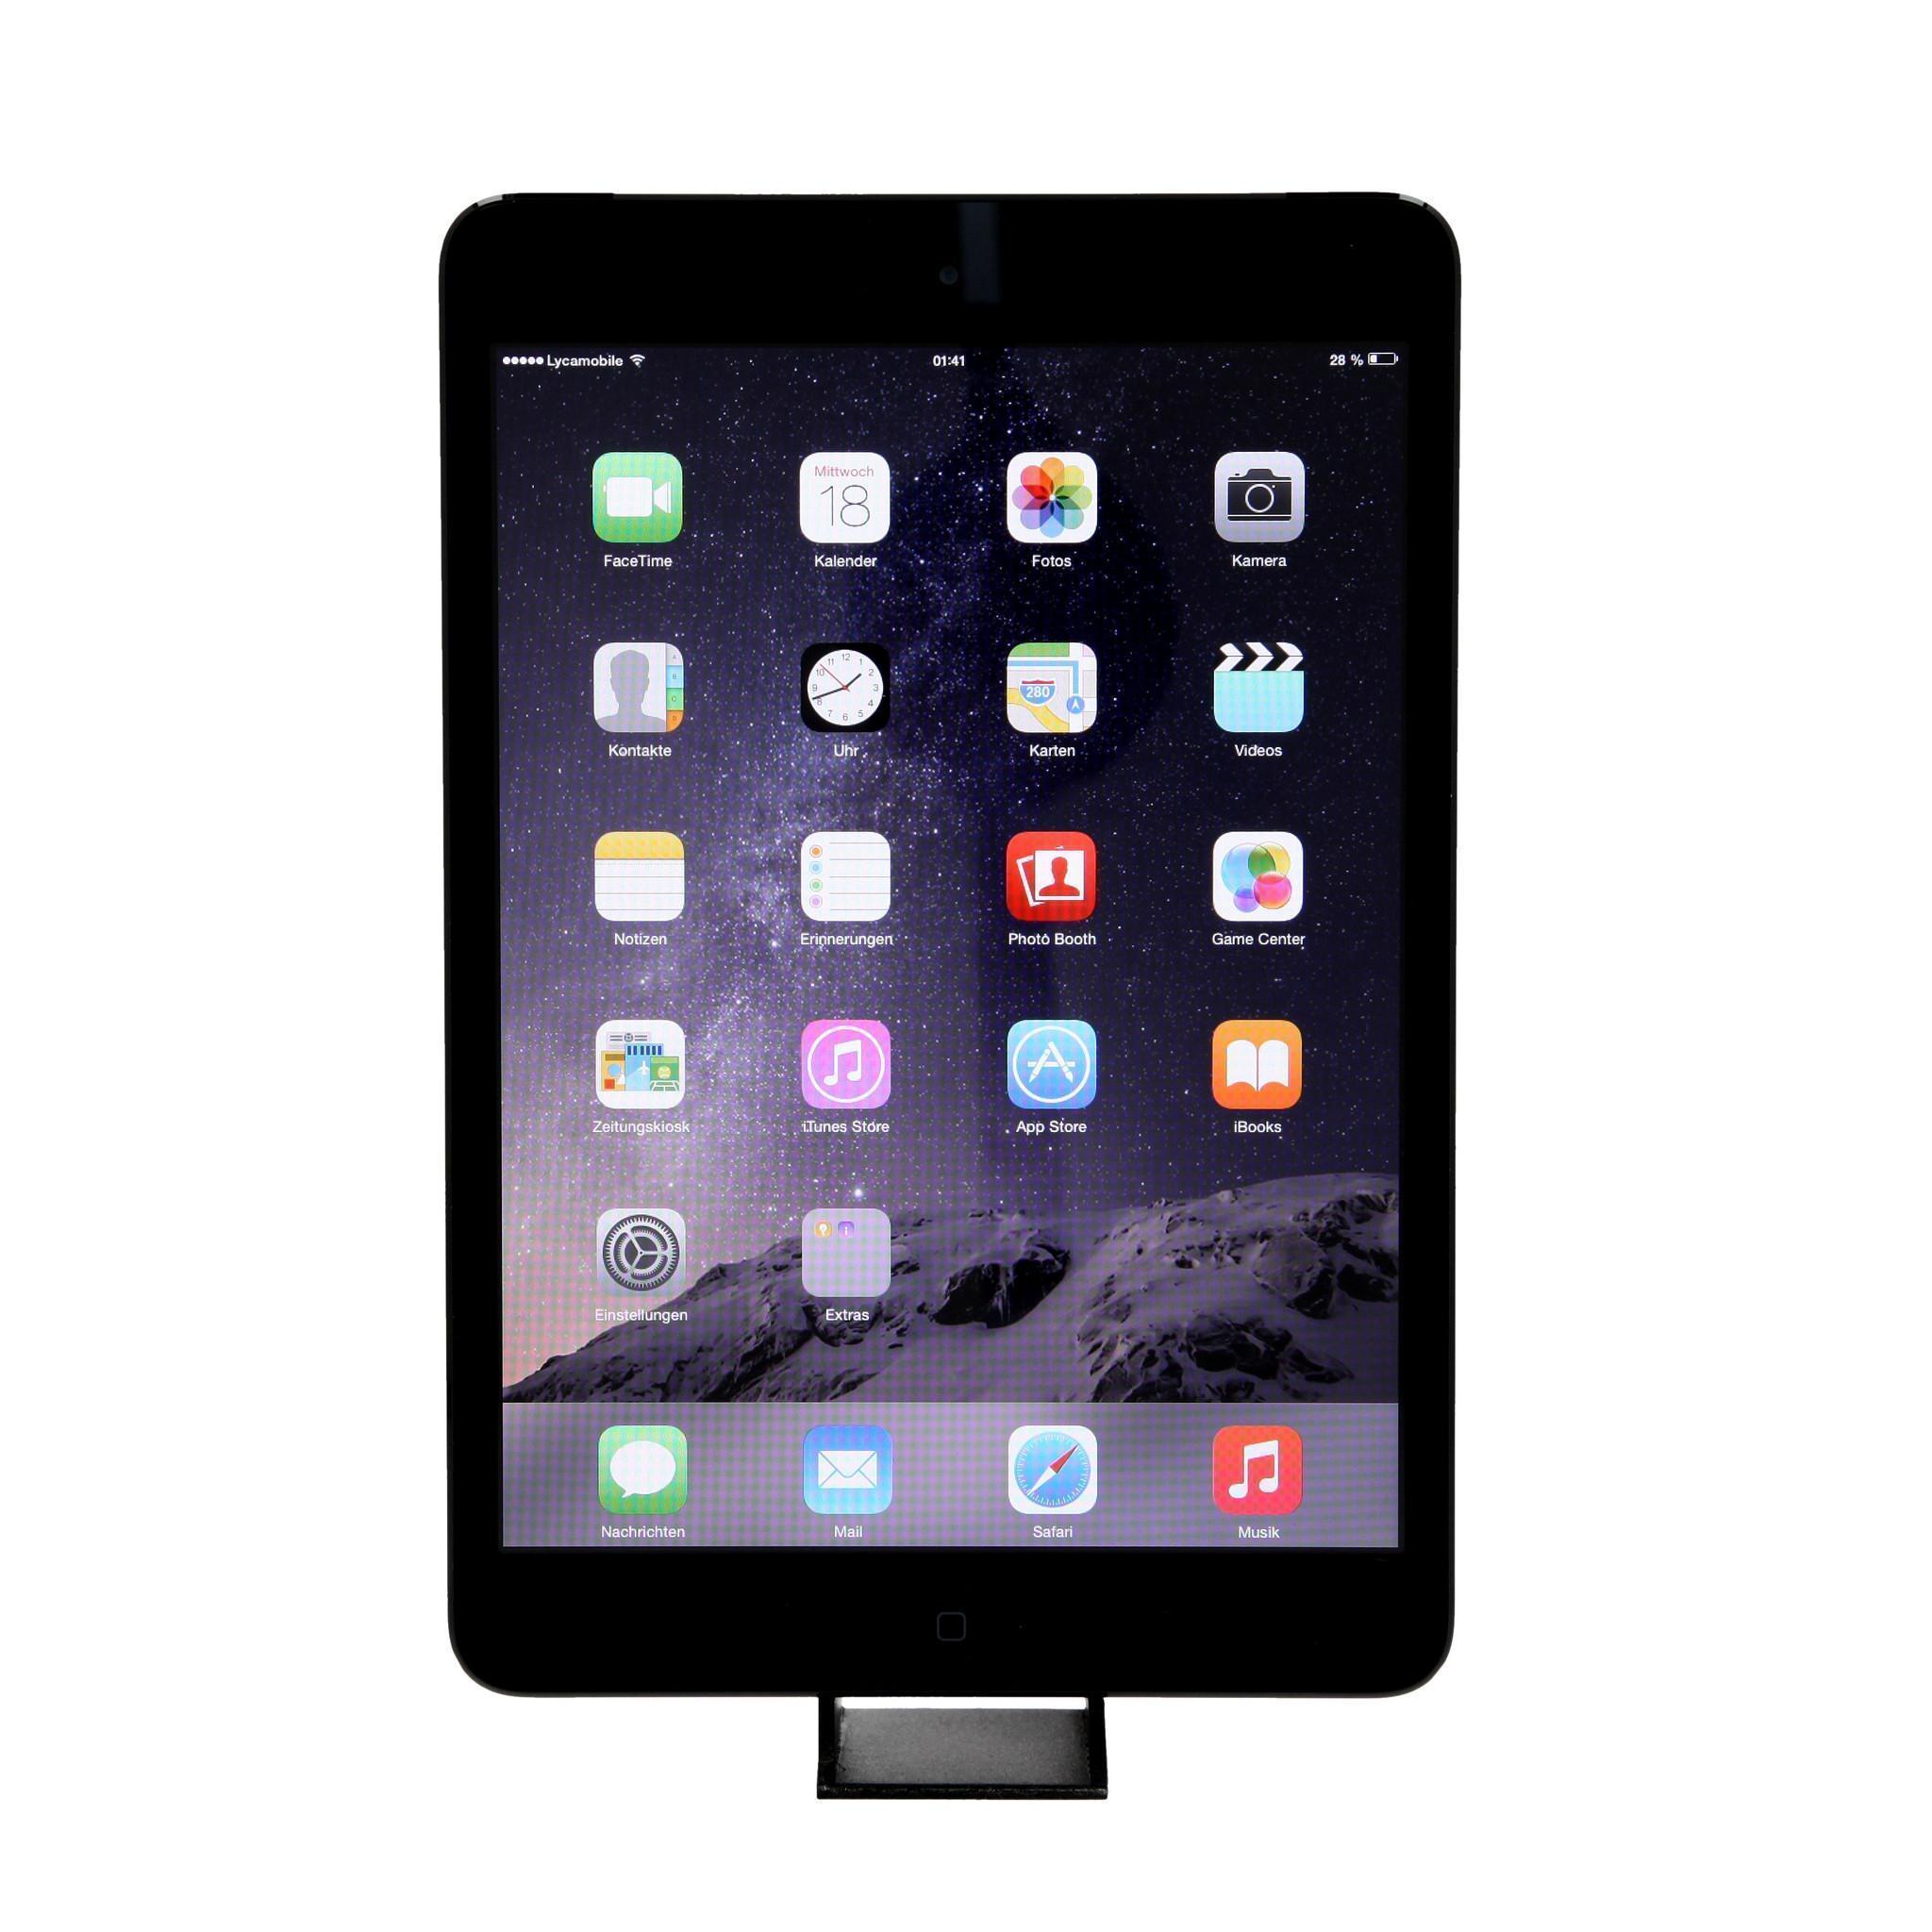 iPad mini 16 Gb LTE - Schwarz - Ohne Vertrag